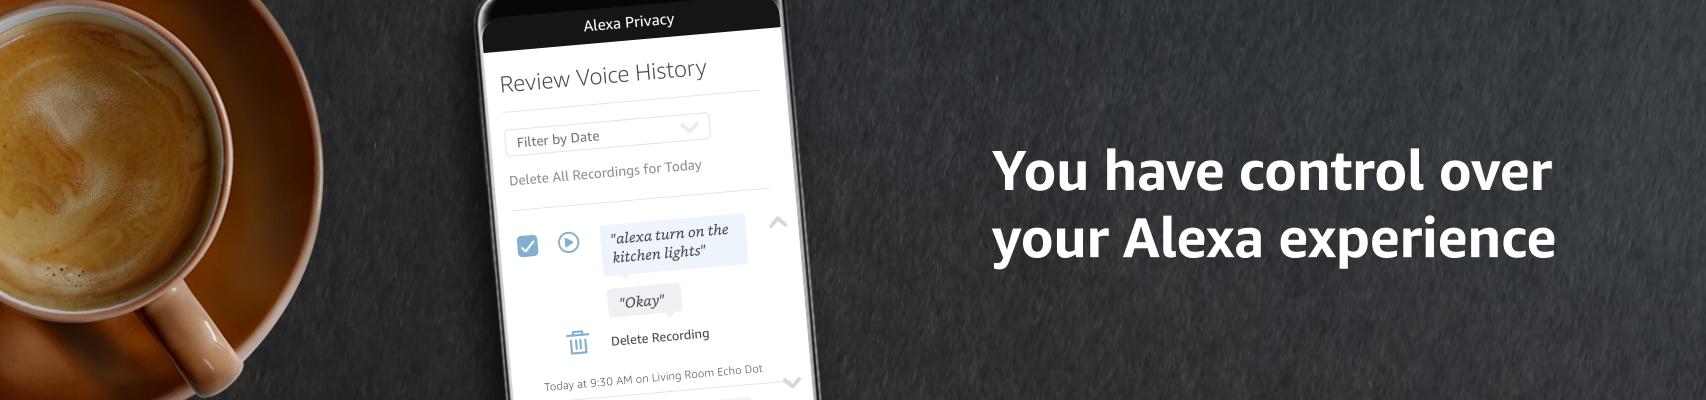 Alexa Privacy Settings | Amazon com